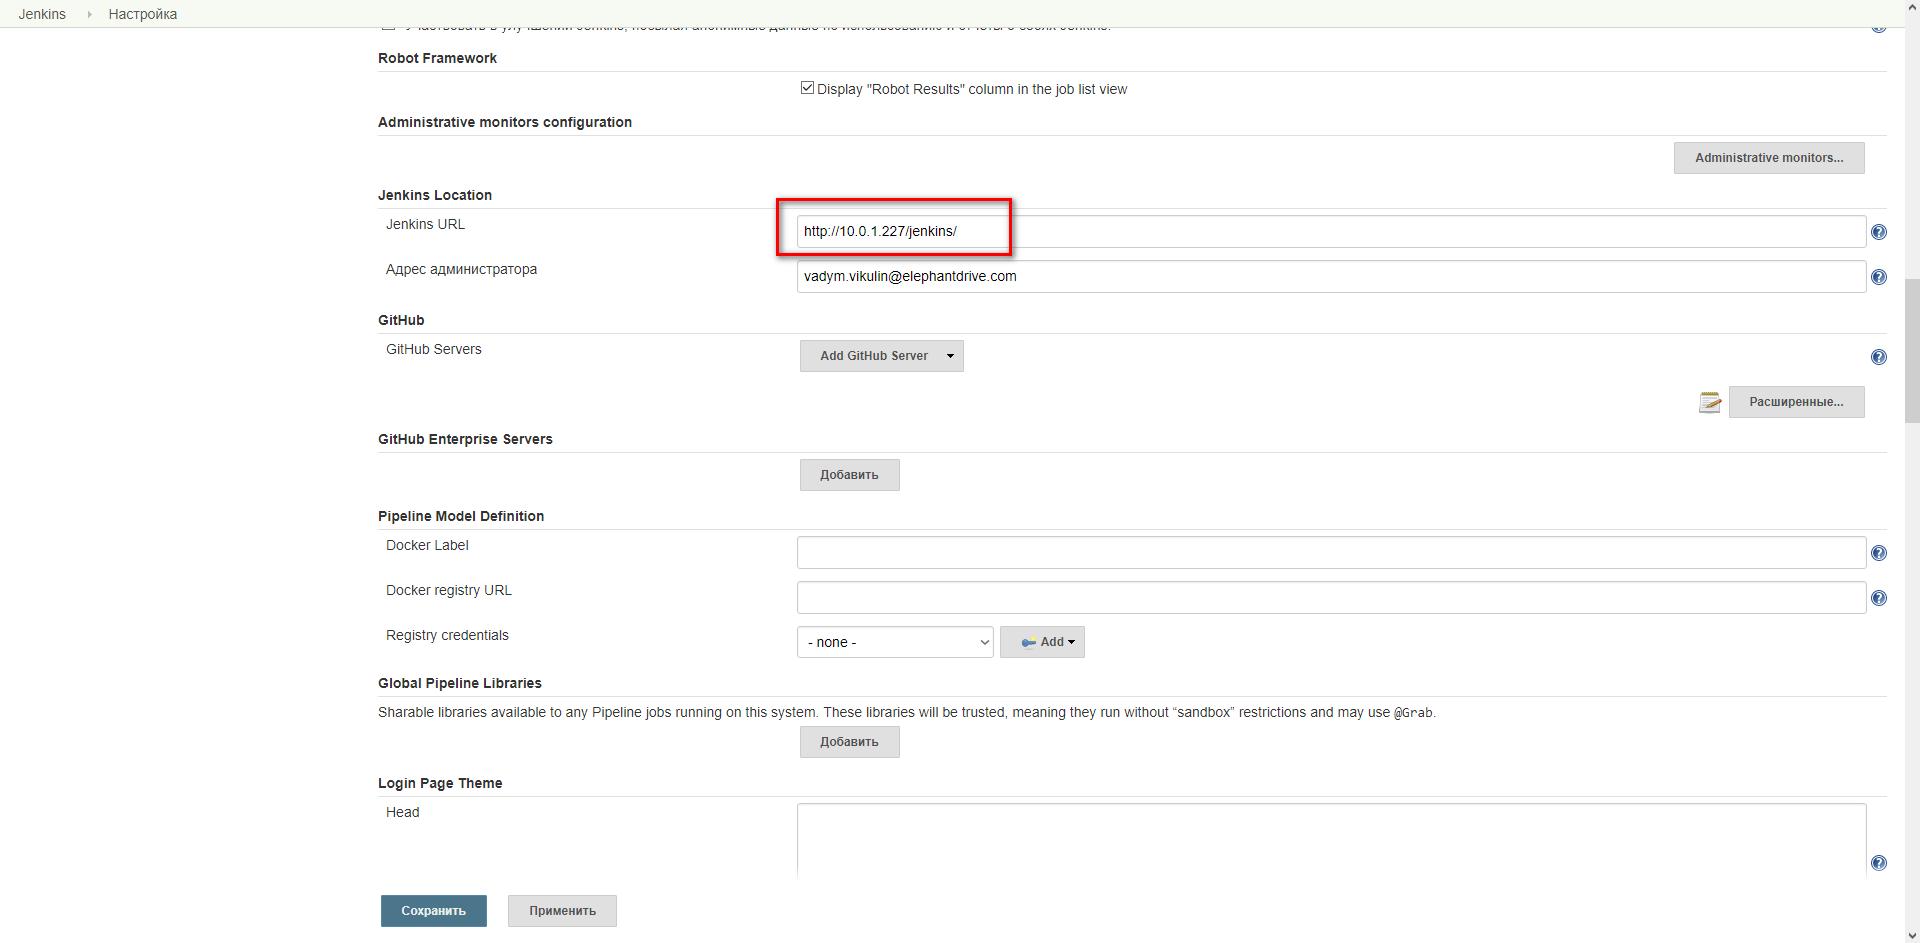 JENKINS-53341] Simple theme plugin leads performance impact